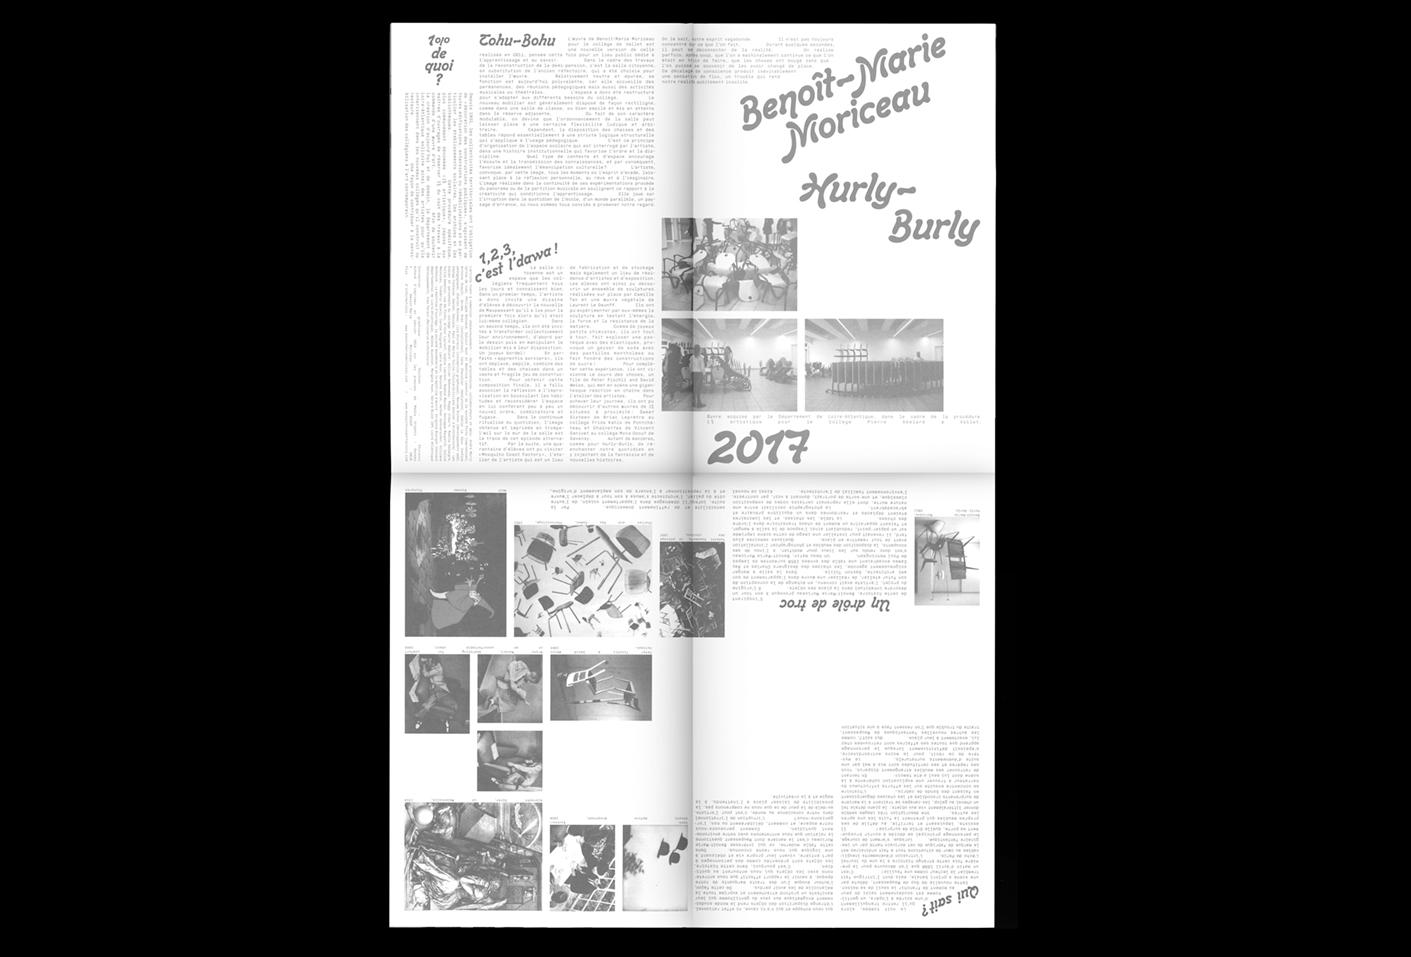 Hurly-Burly — Lisa Sturacci Graphiste